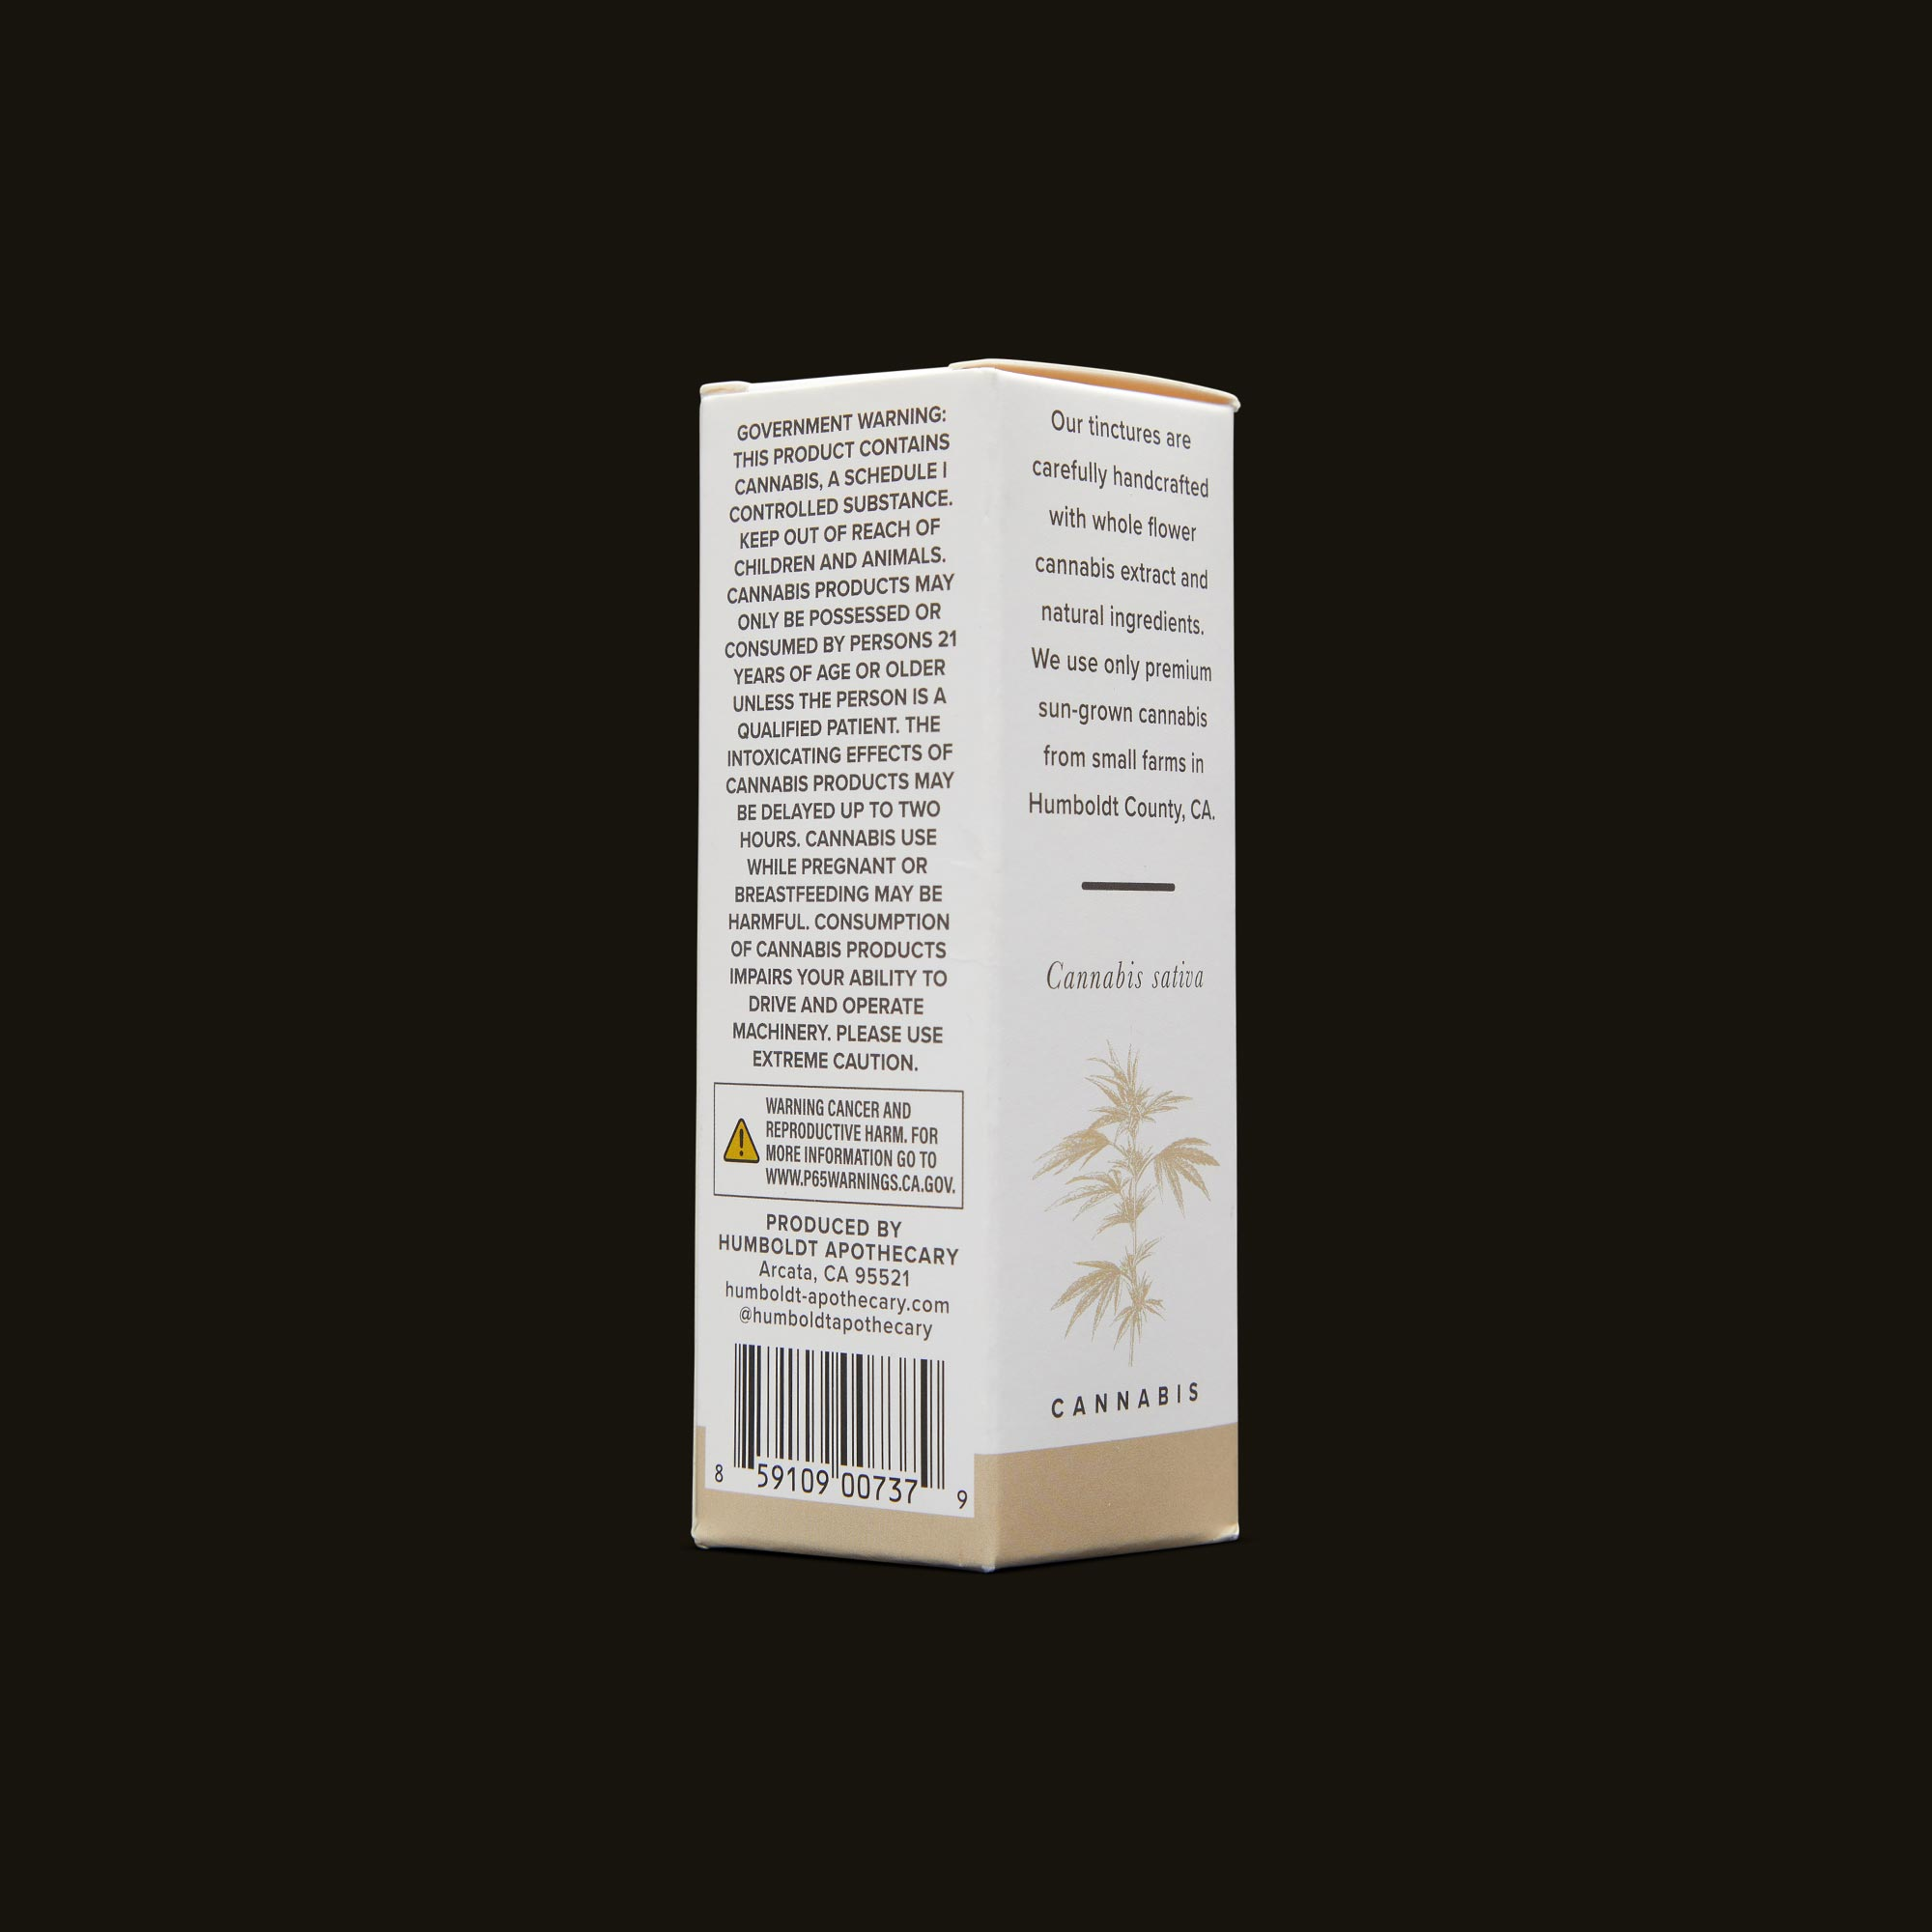 Humboldt Apothecary Pet CBD 20:1 Back Packaging